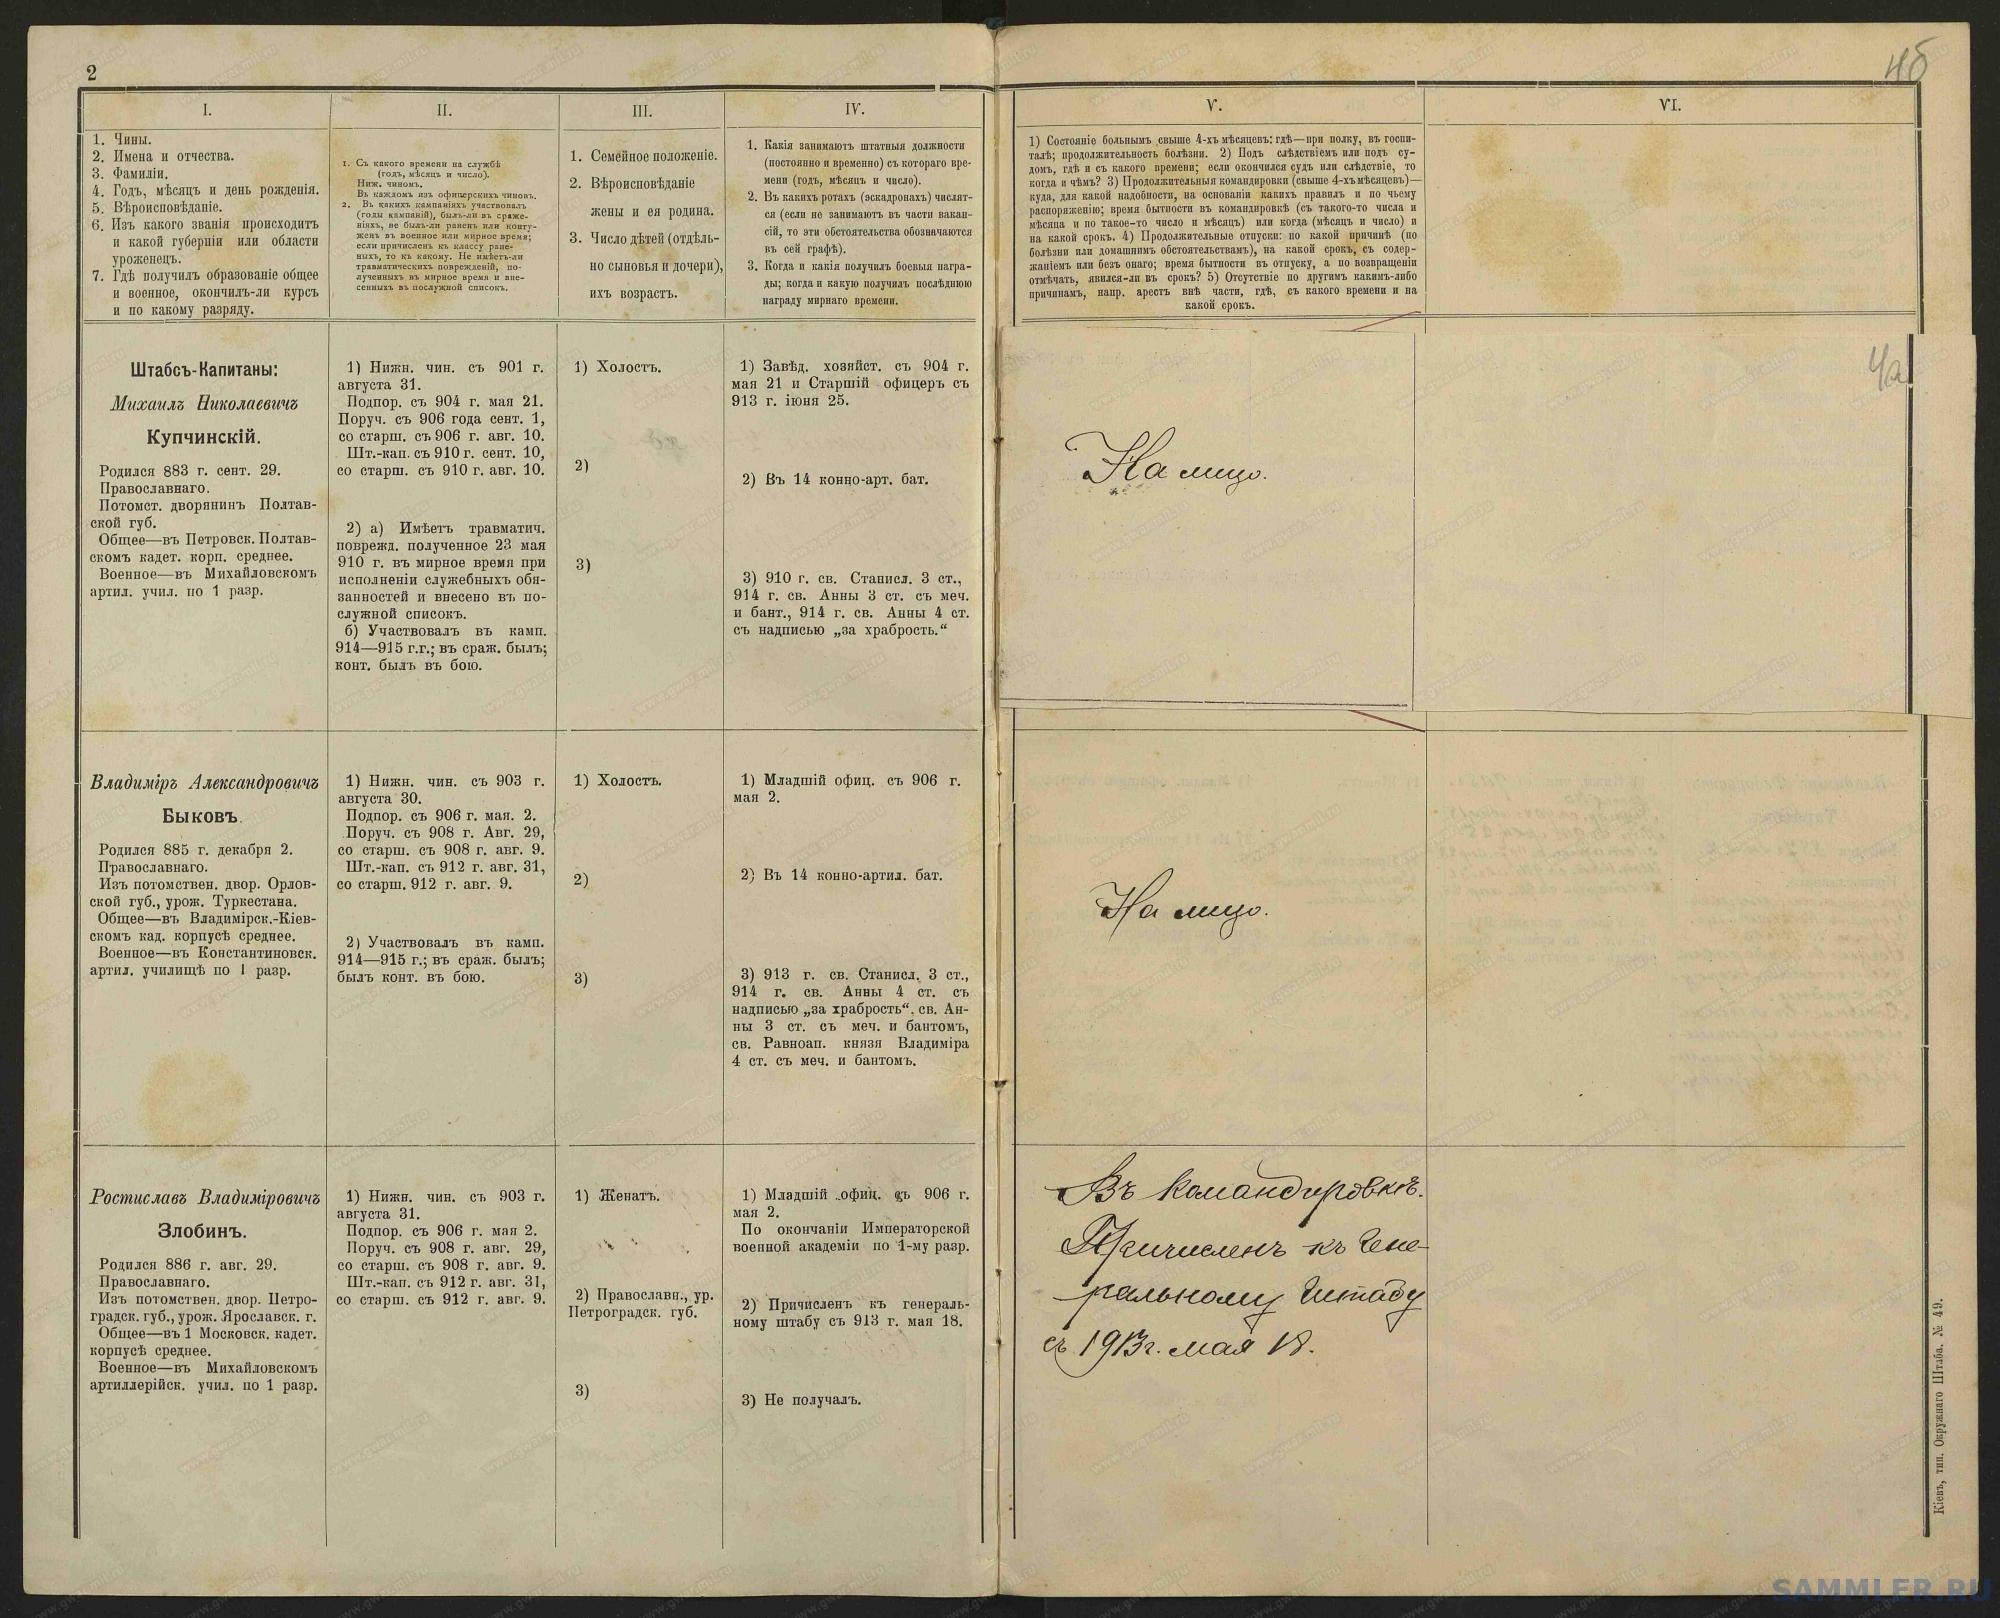 Список офицеров 7-го конно-артиллерийского дивизиона на 01.01.1915__04_.jpg